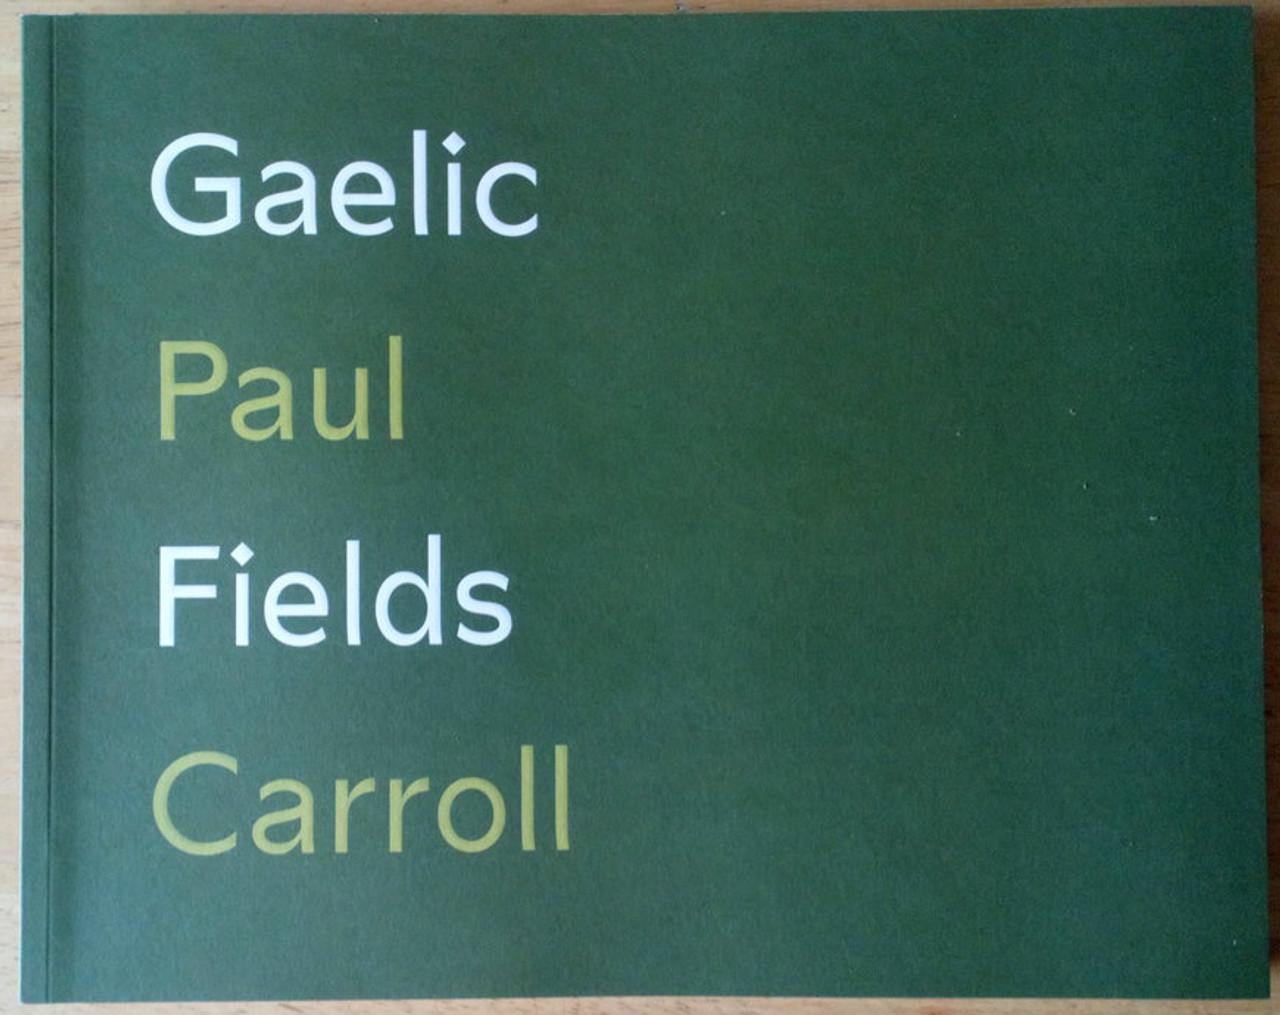 Carroll, Paul - Gaelic Fields - A Photographic Journey GAA Ireland Limited Edition Signed